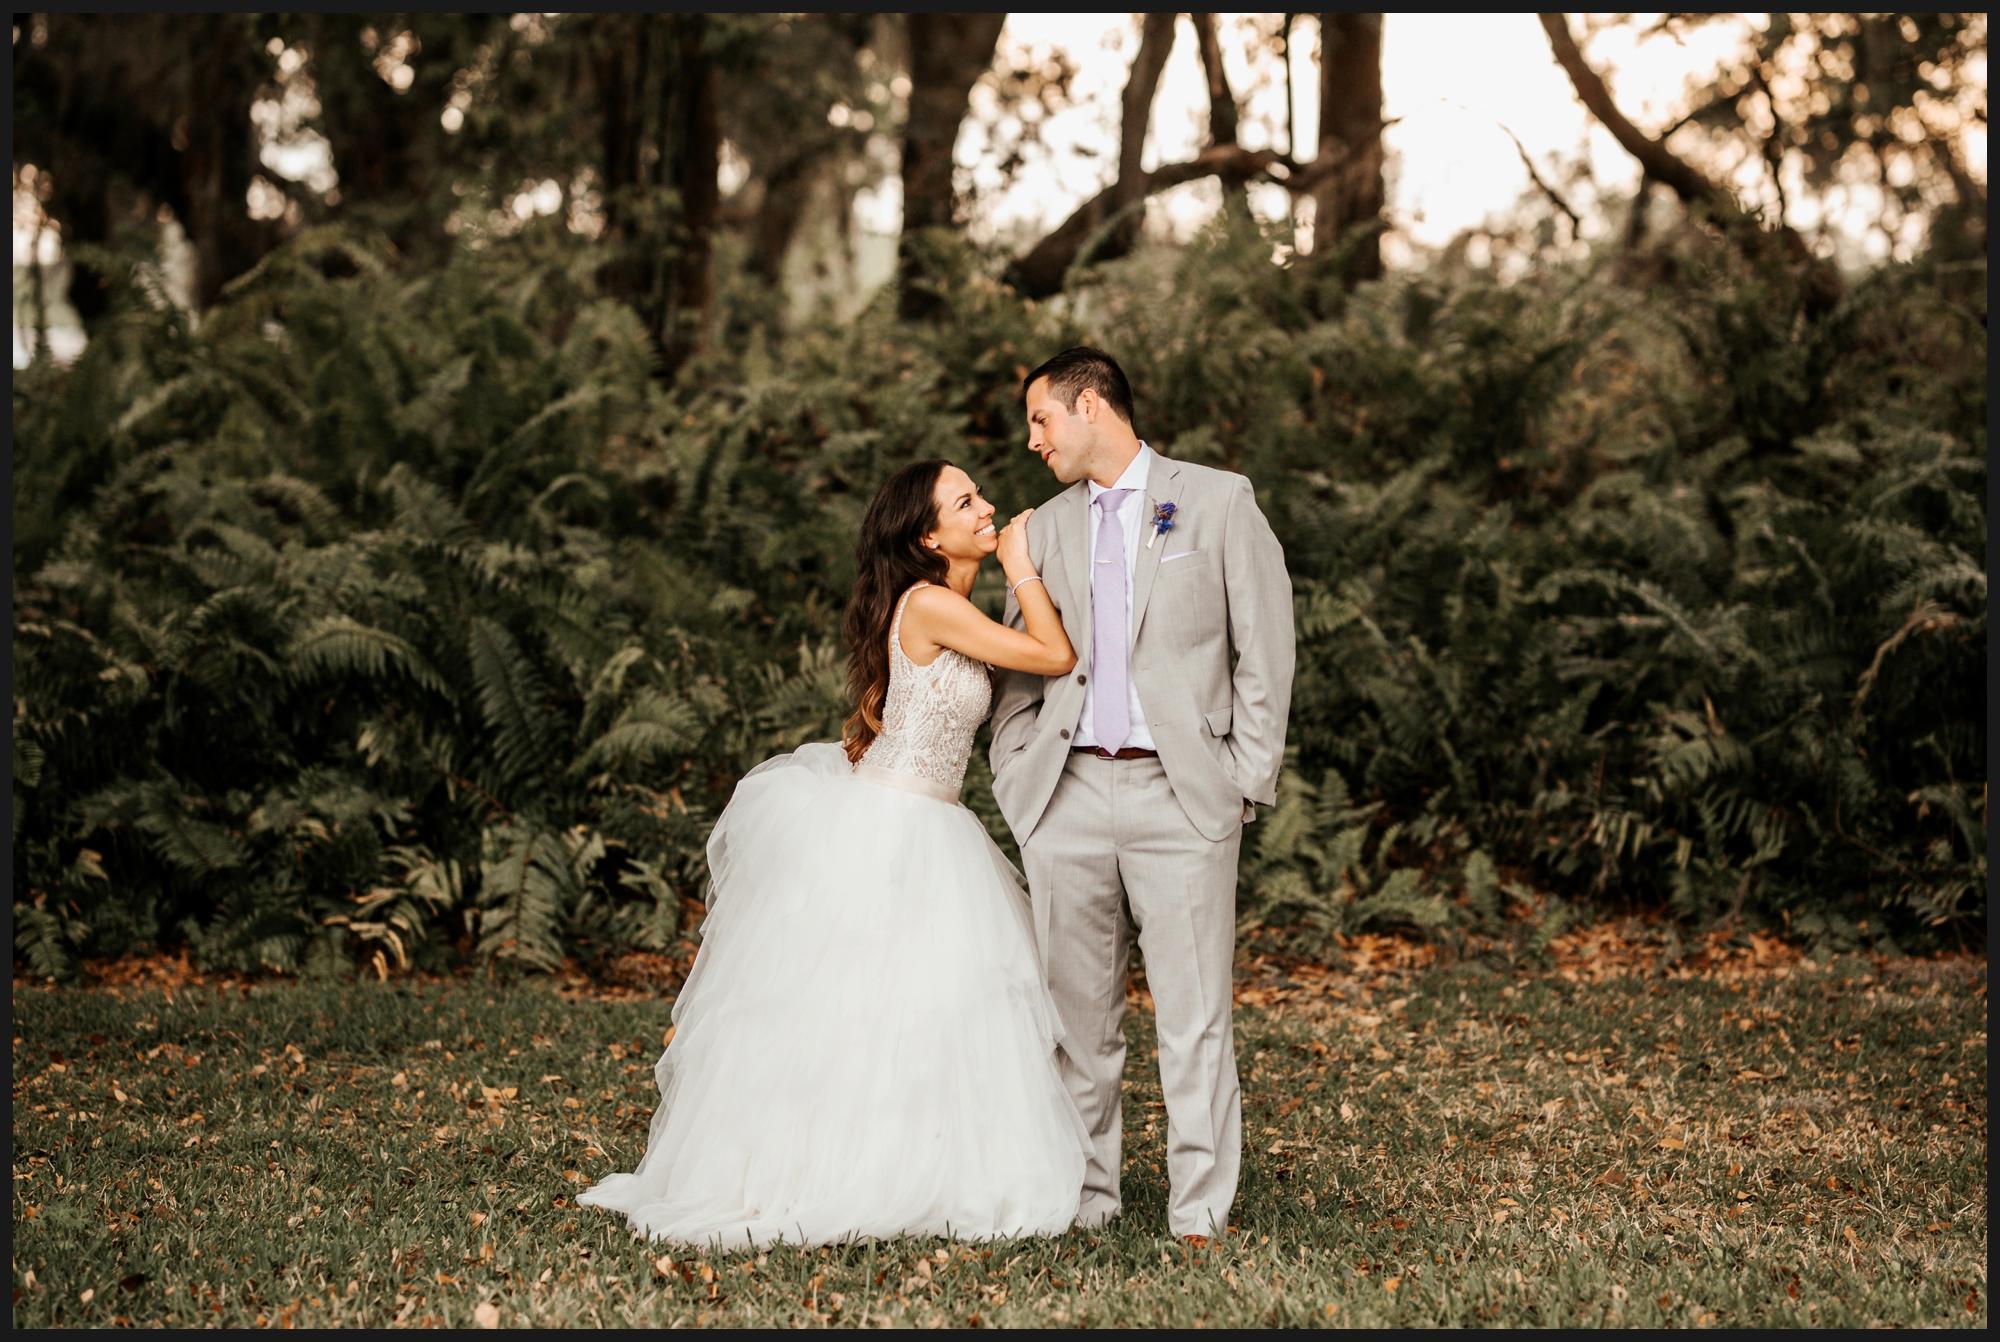 Orlando-Wedding-Photographer-destination-wedding-photographer-florida-wedding-photographer-bohemian-wedding-photographer_1644.jpg